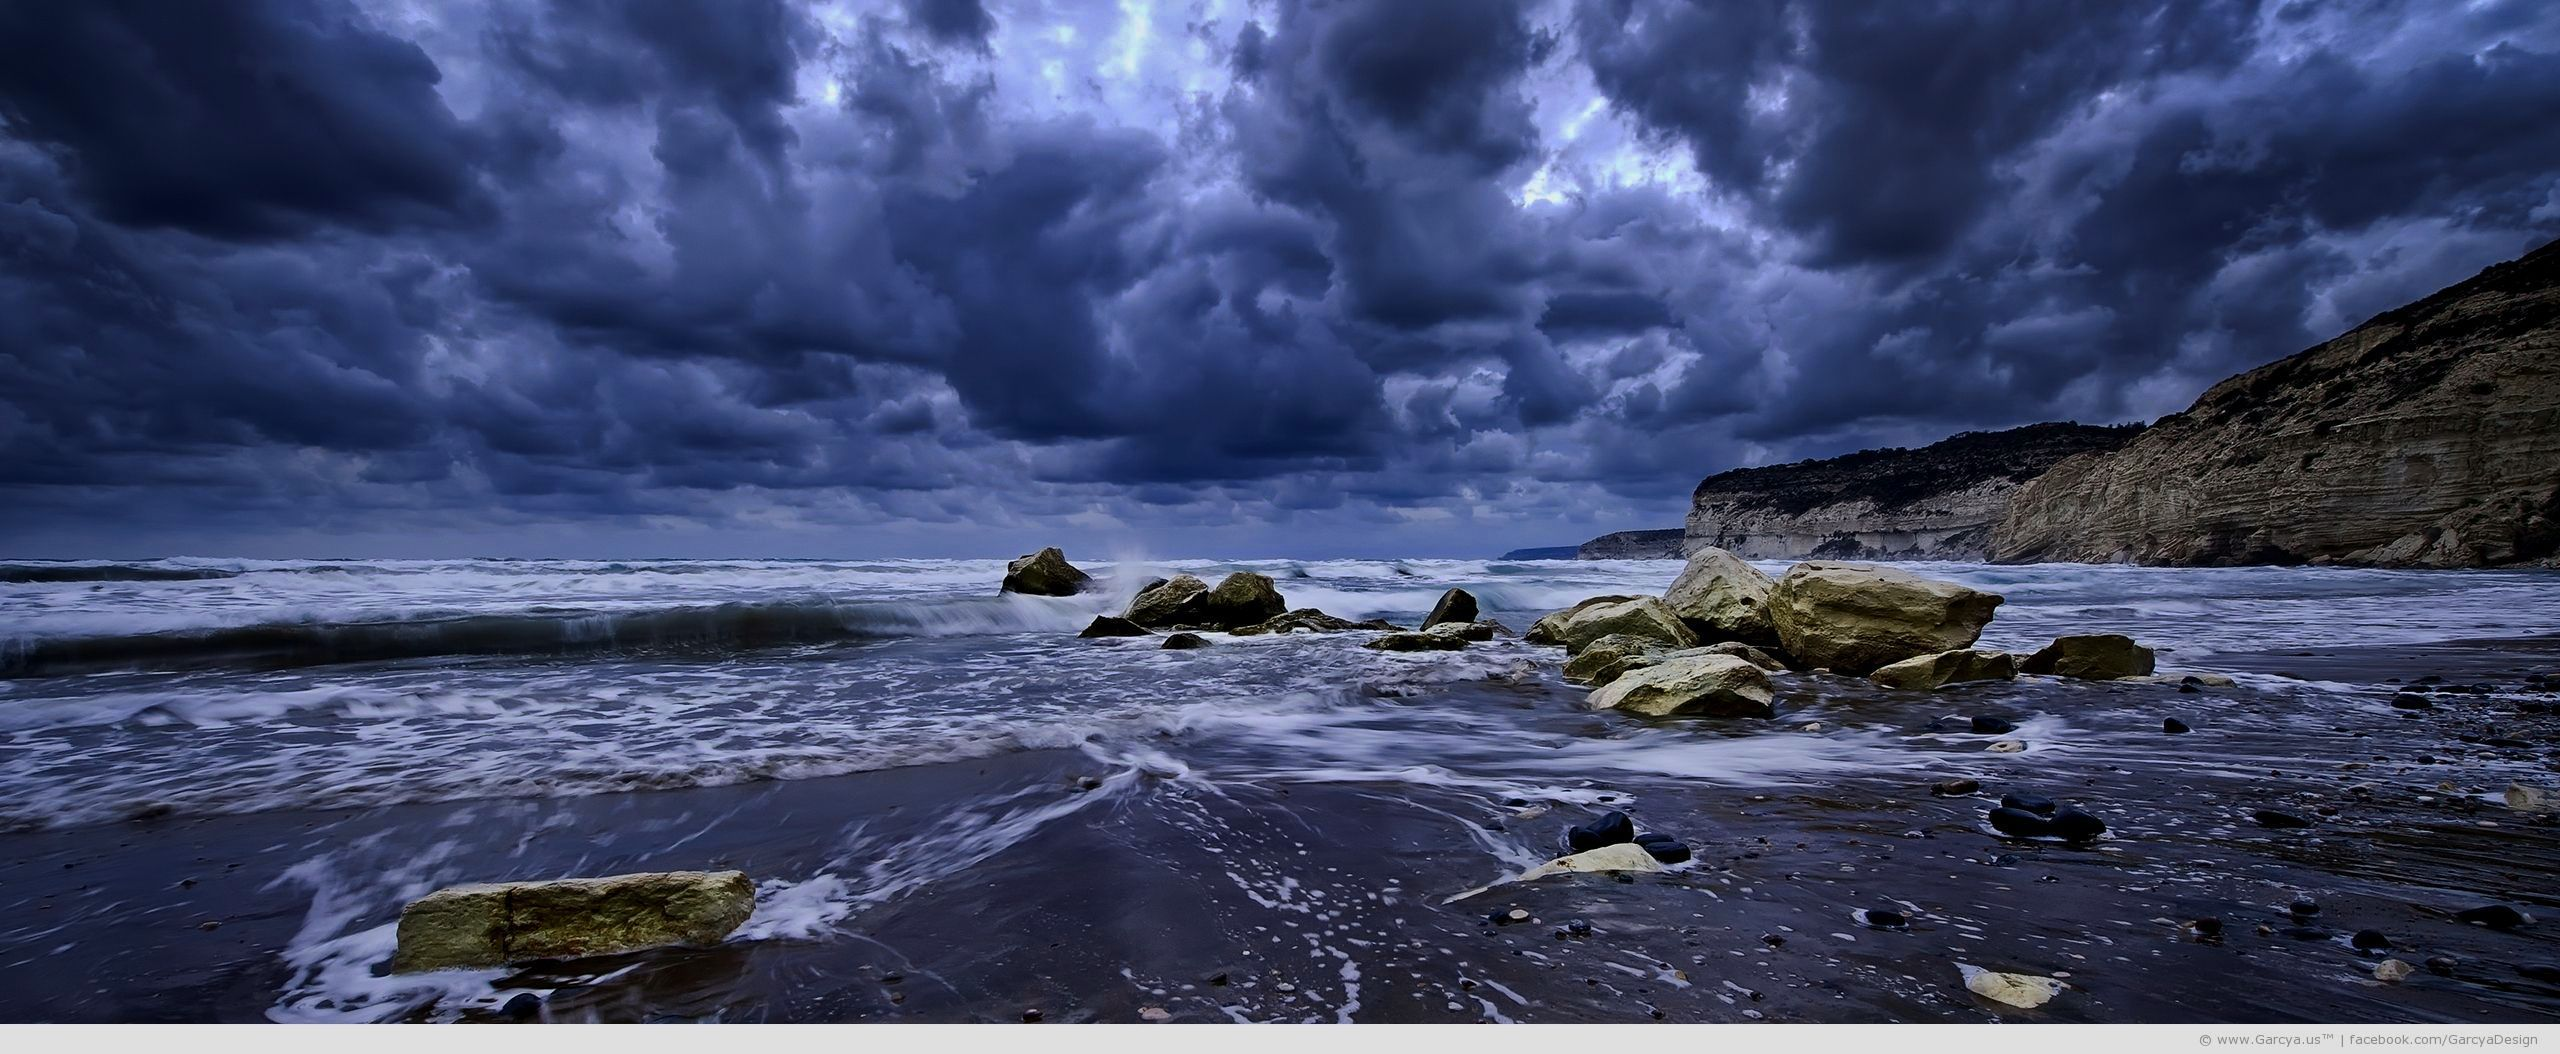 Beach 4k Hd Desktop Wallpaper For Dual Monitor Desktops